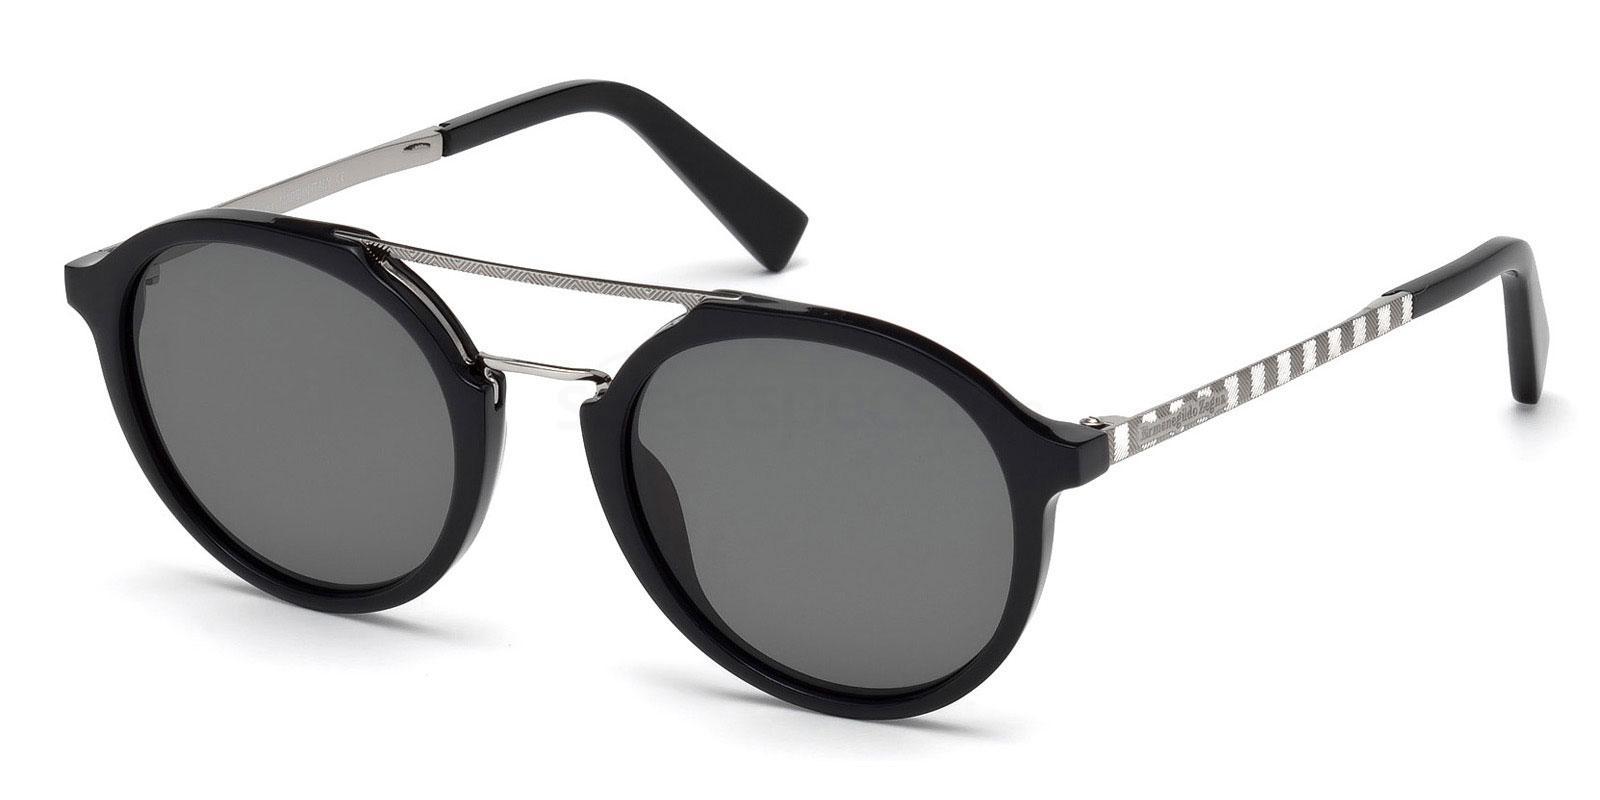 01A EZ0070 Sunglasses, Ermenegildo Zegna